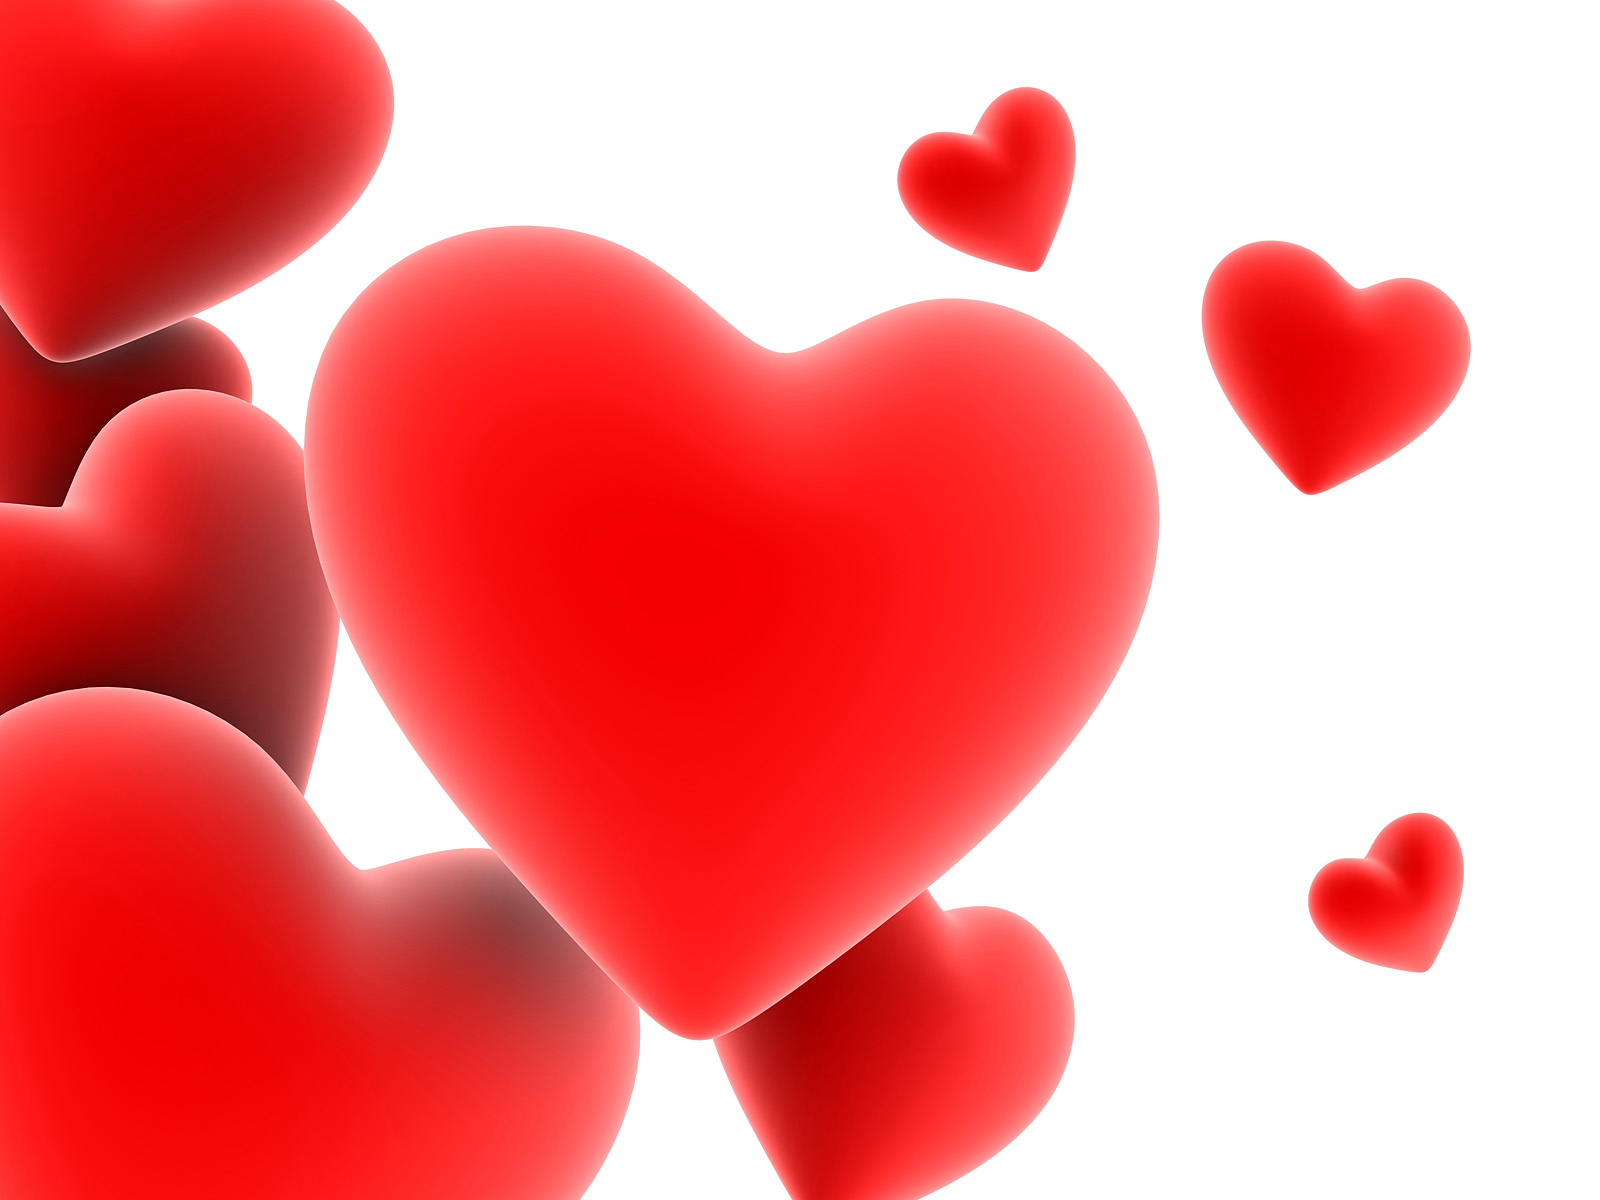 50 Heart Hd Wallpapers In Full Screen On Wallpapersafari